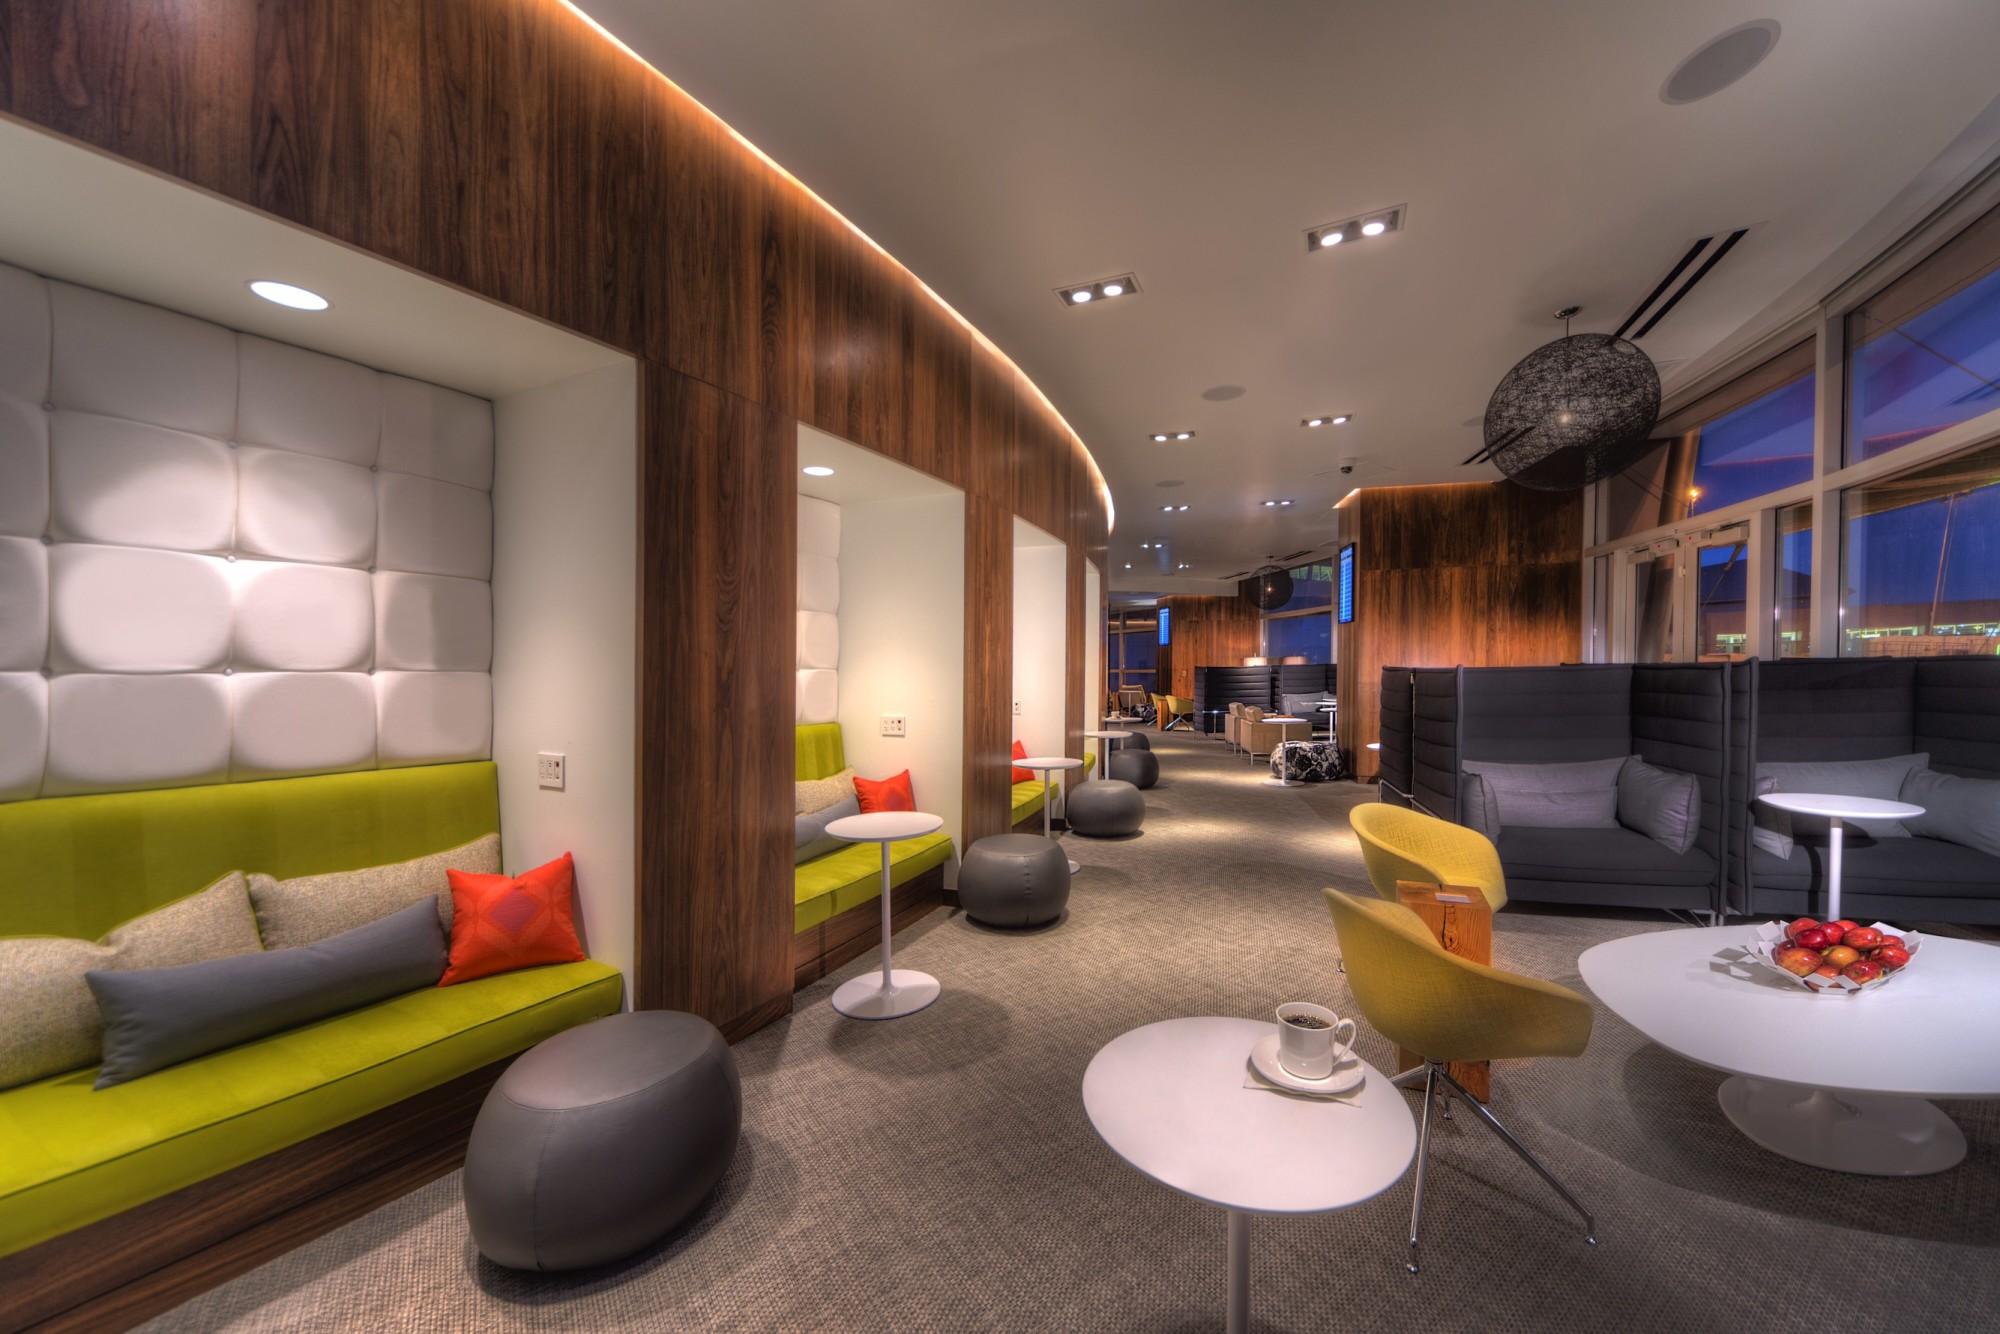 LAS: The Centurion Lounge Reviews \u0026 Photos - Terminal 1, Concourse ...